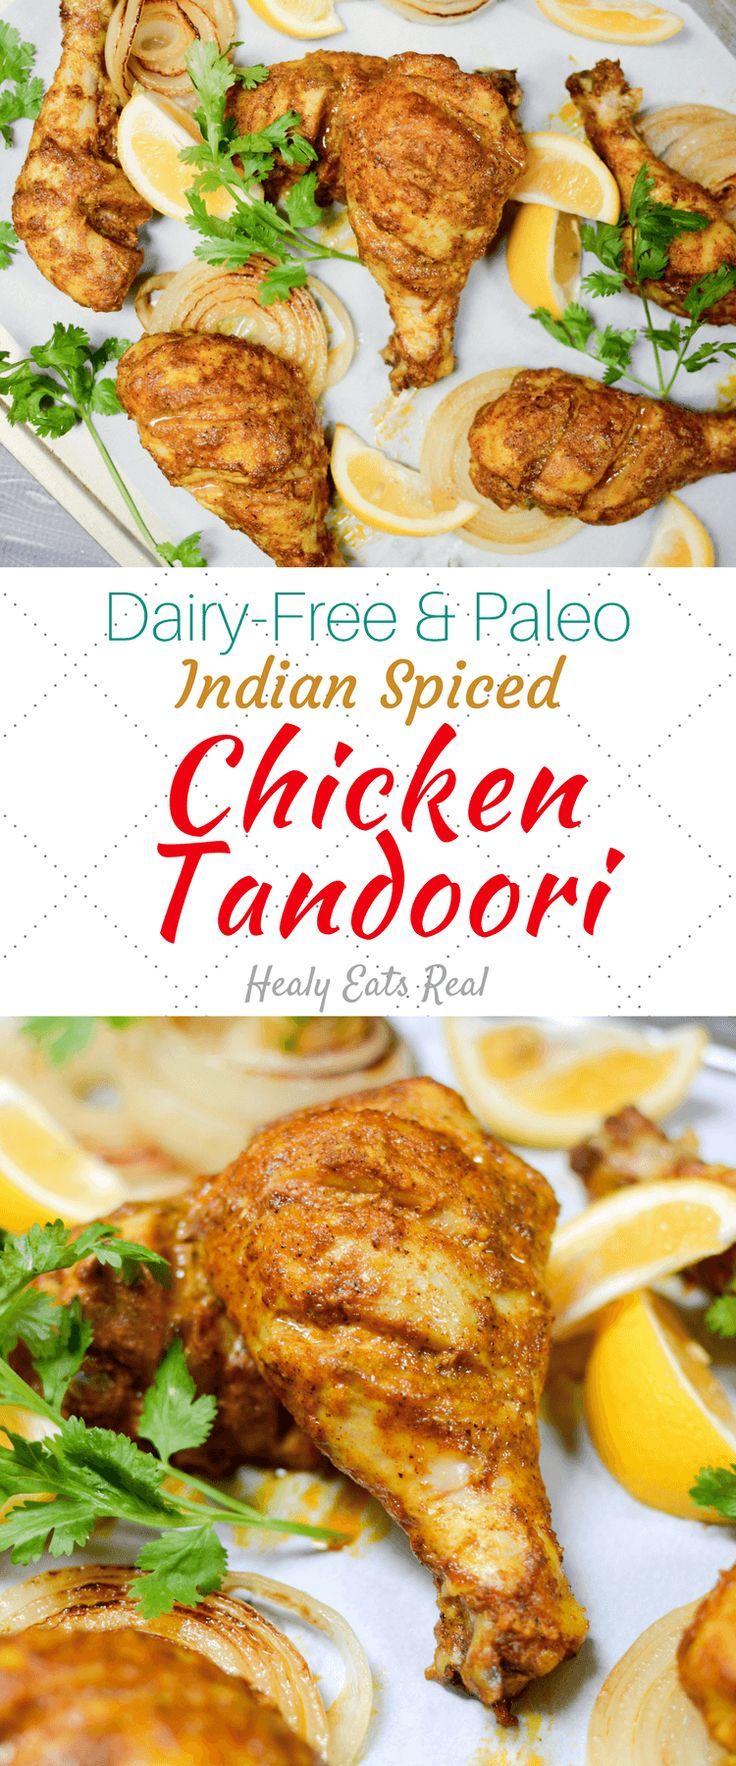 Chicken Tandoori Recipe (Dairy Free & Paleo) - great healthy lunch or dinner recipe!